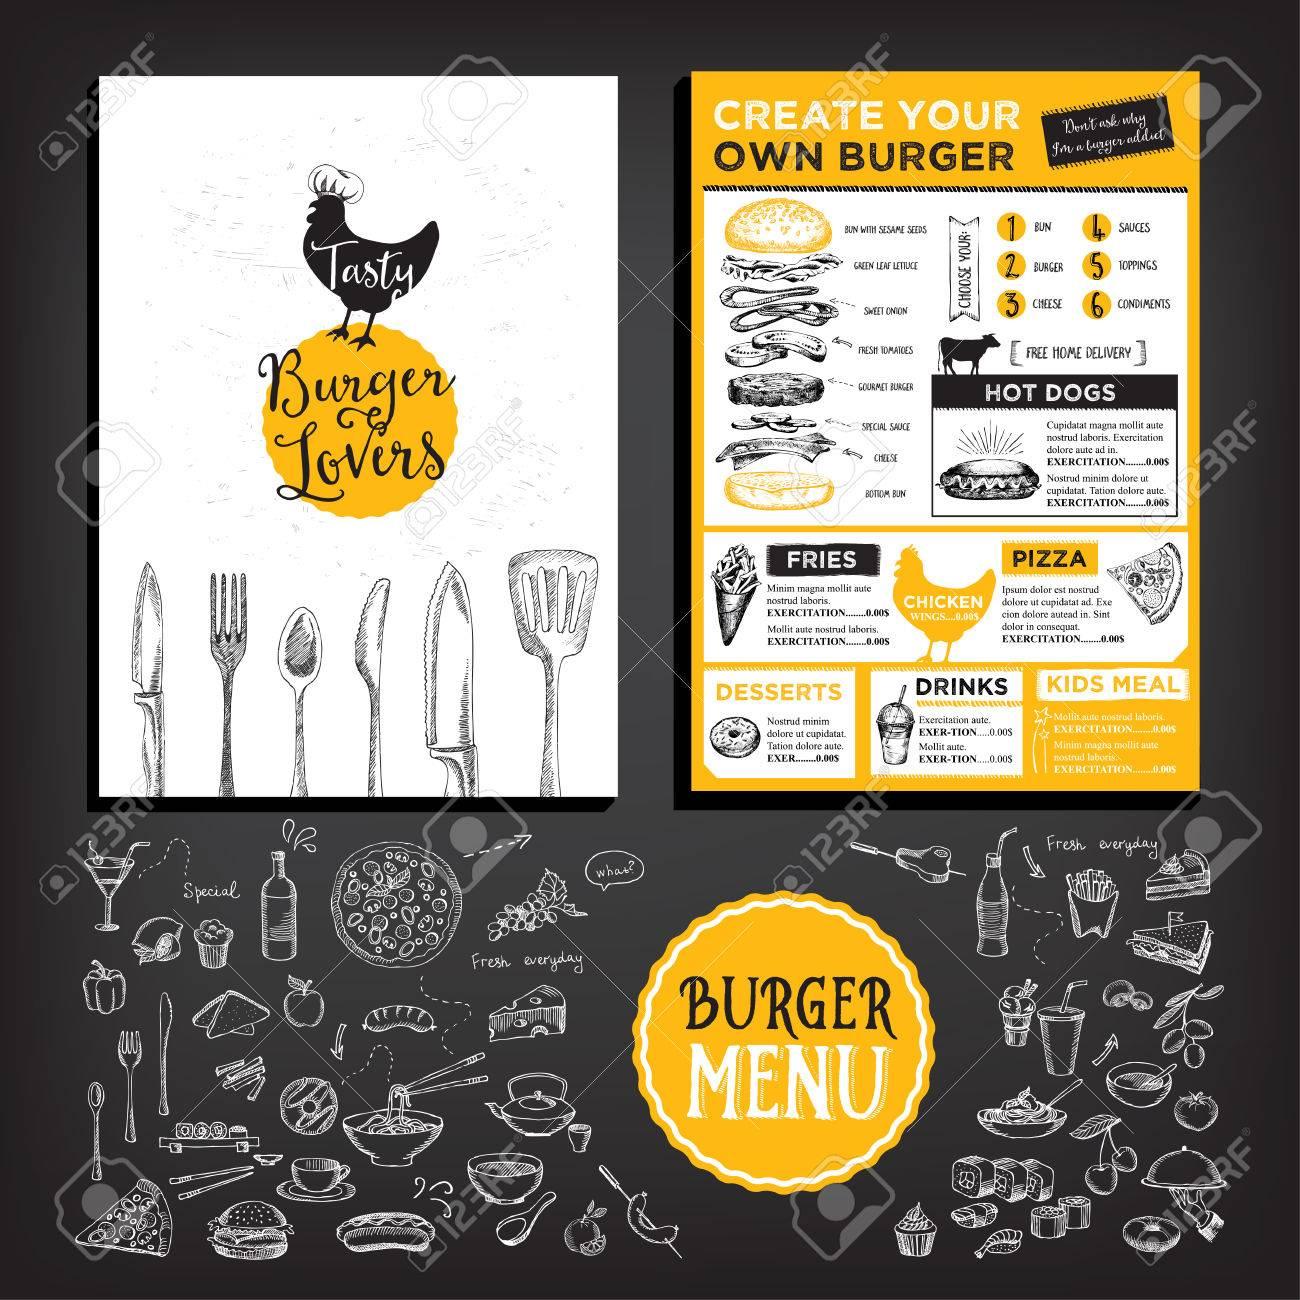 Food menu, restaurant template design. - 53218907